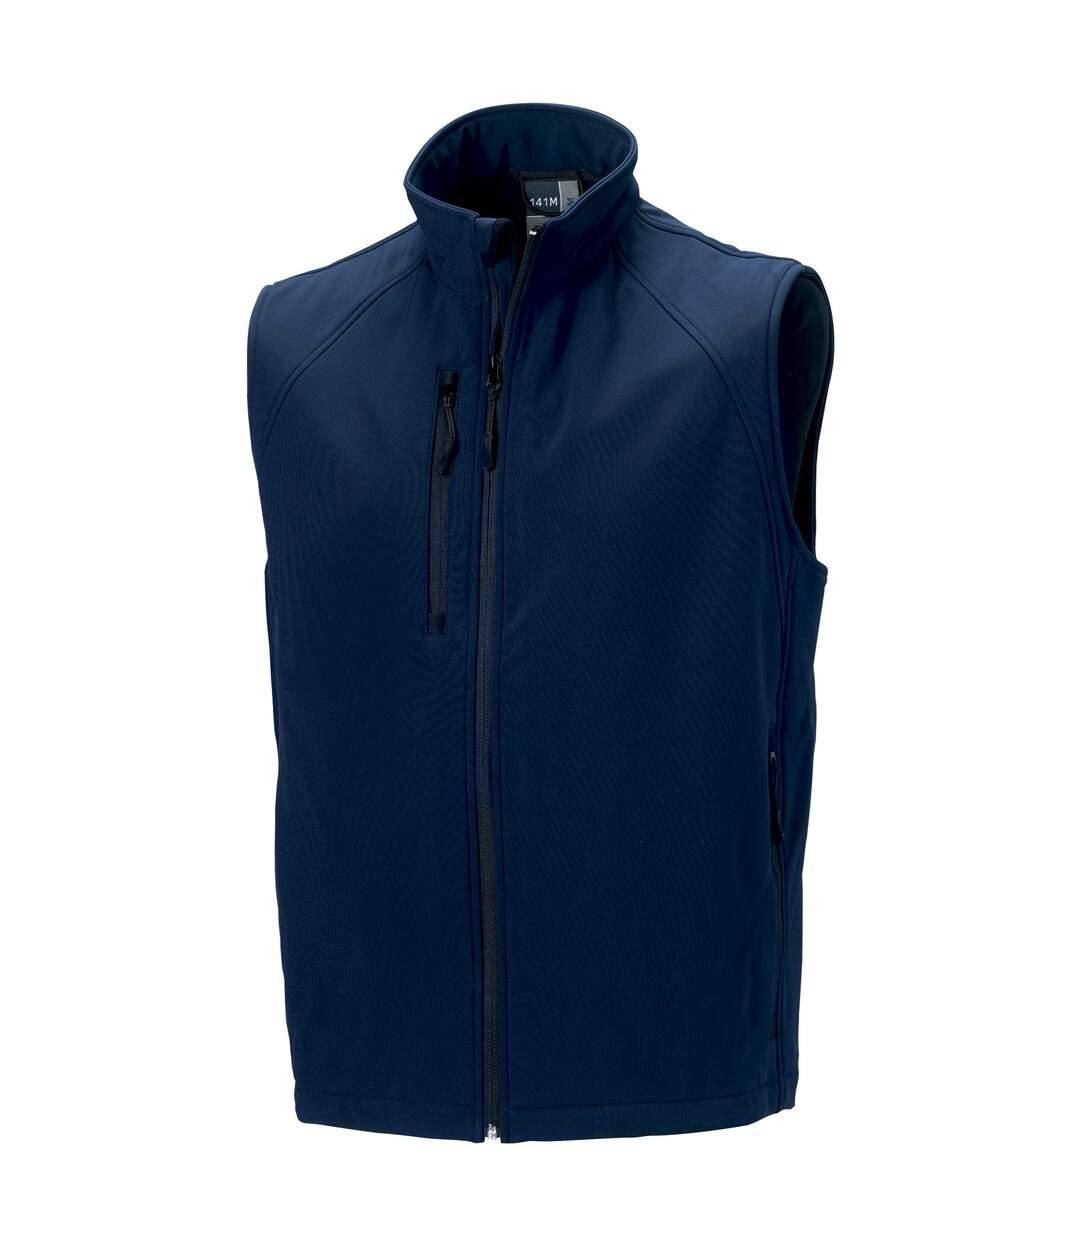 Russell - Veste Sans Manches En Softshell - Homme (Bleu marine) - UTBC1513